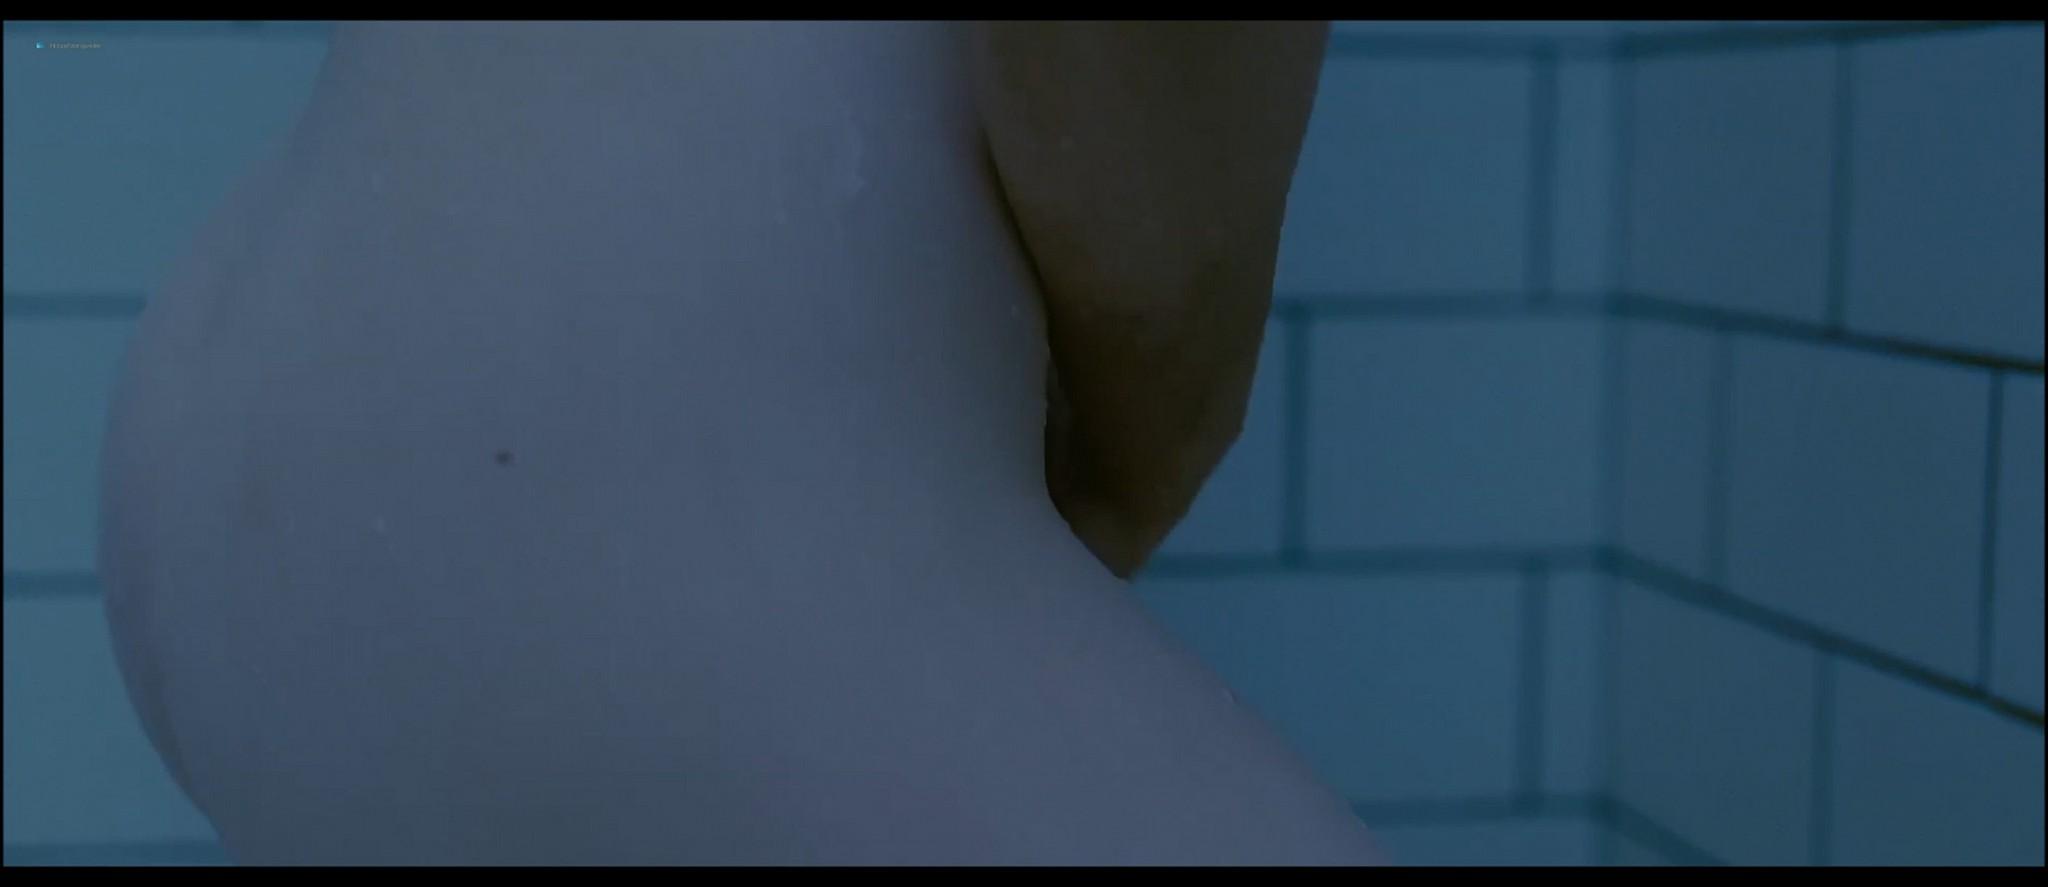 Mia Wasikowska nude nipple peak and butt while masturbating nude in the shower - Stoker (2013) HD 1080p BluRay (4)